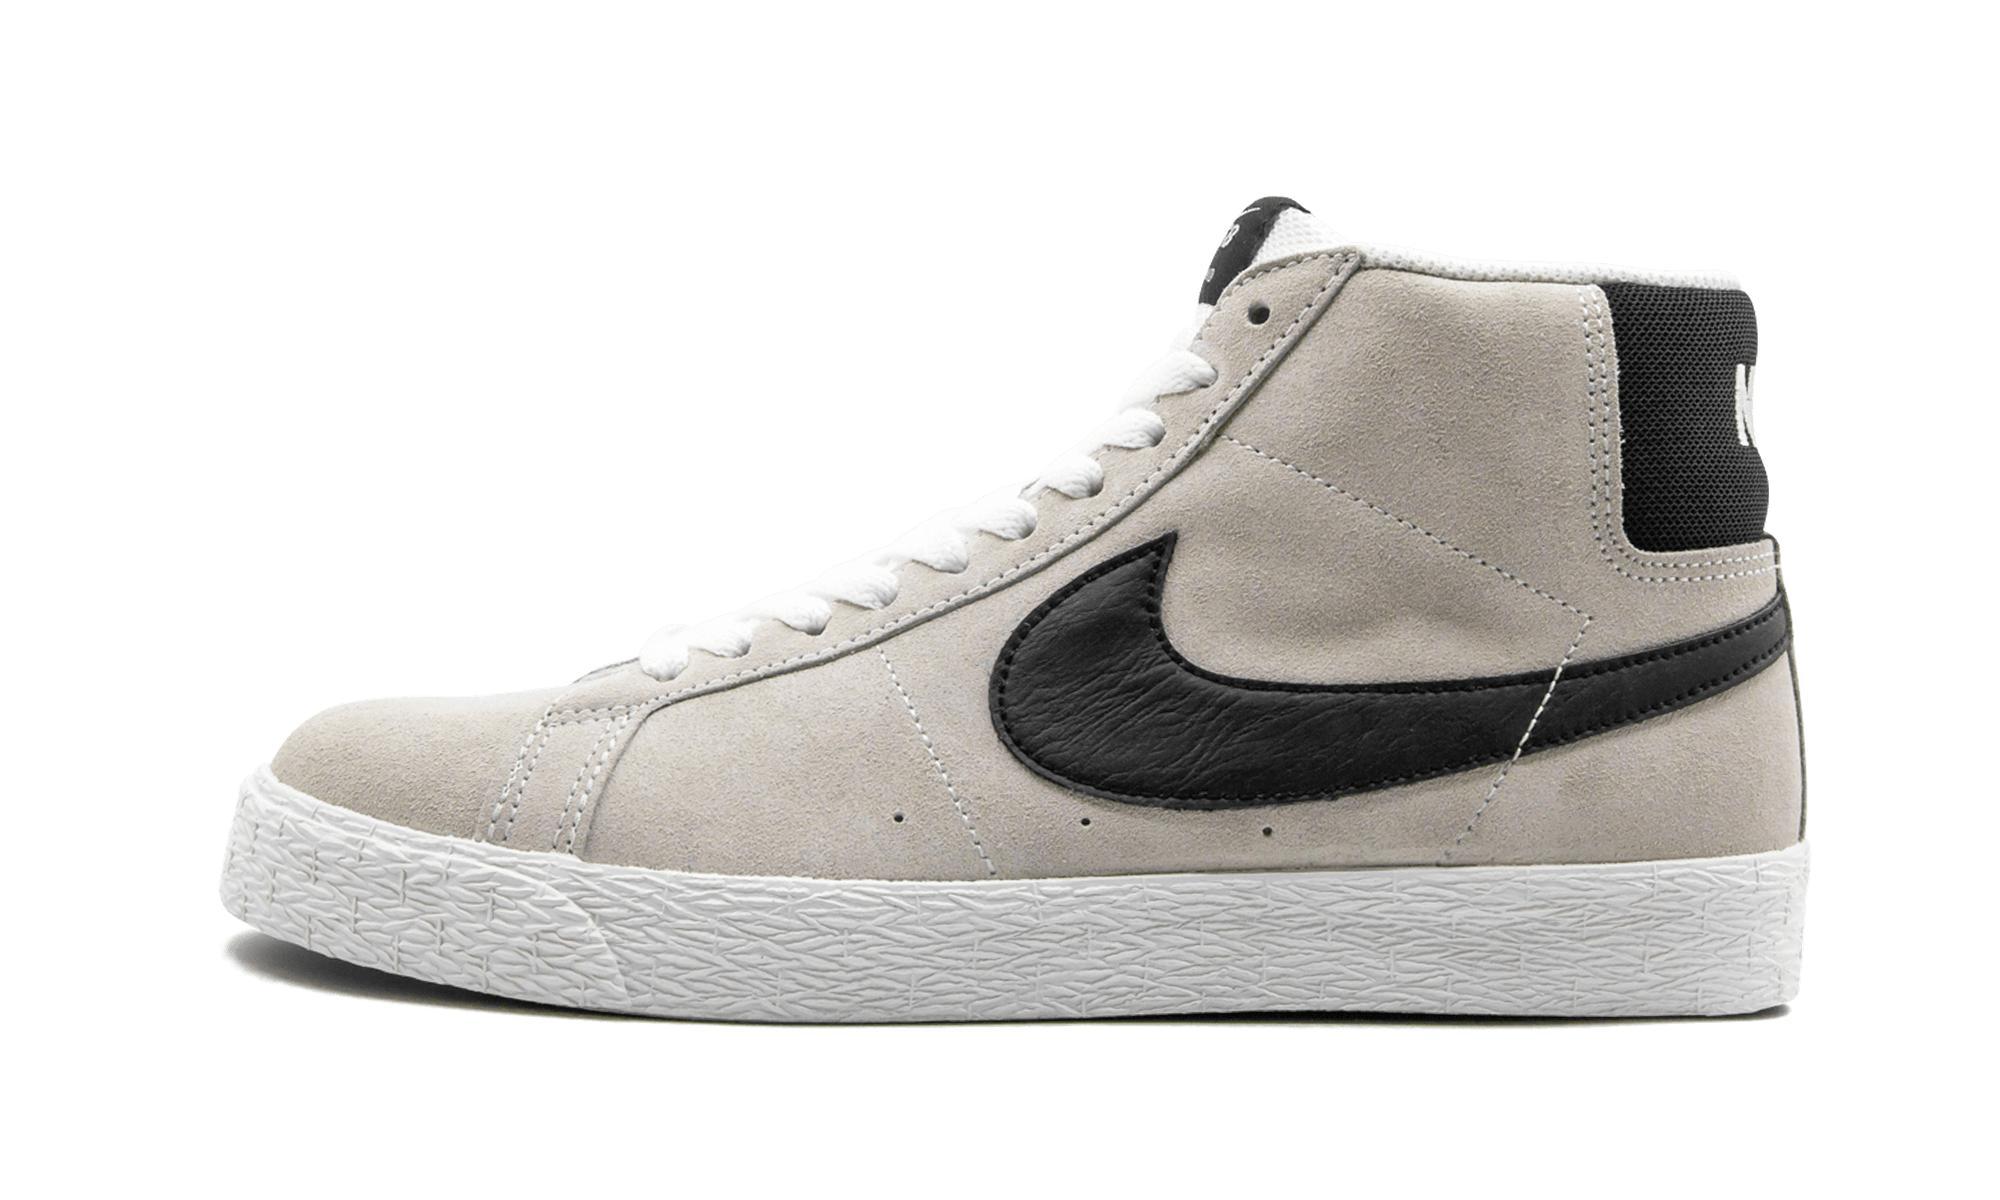 Lyst Lyst Lyst Nike Blazer Sb Premium Se in bianca for Uomo 5bcf55